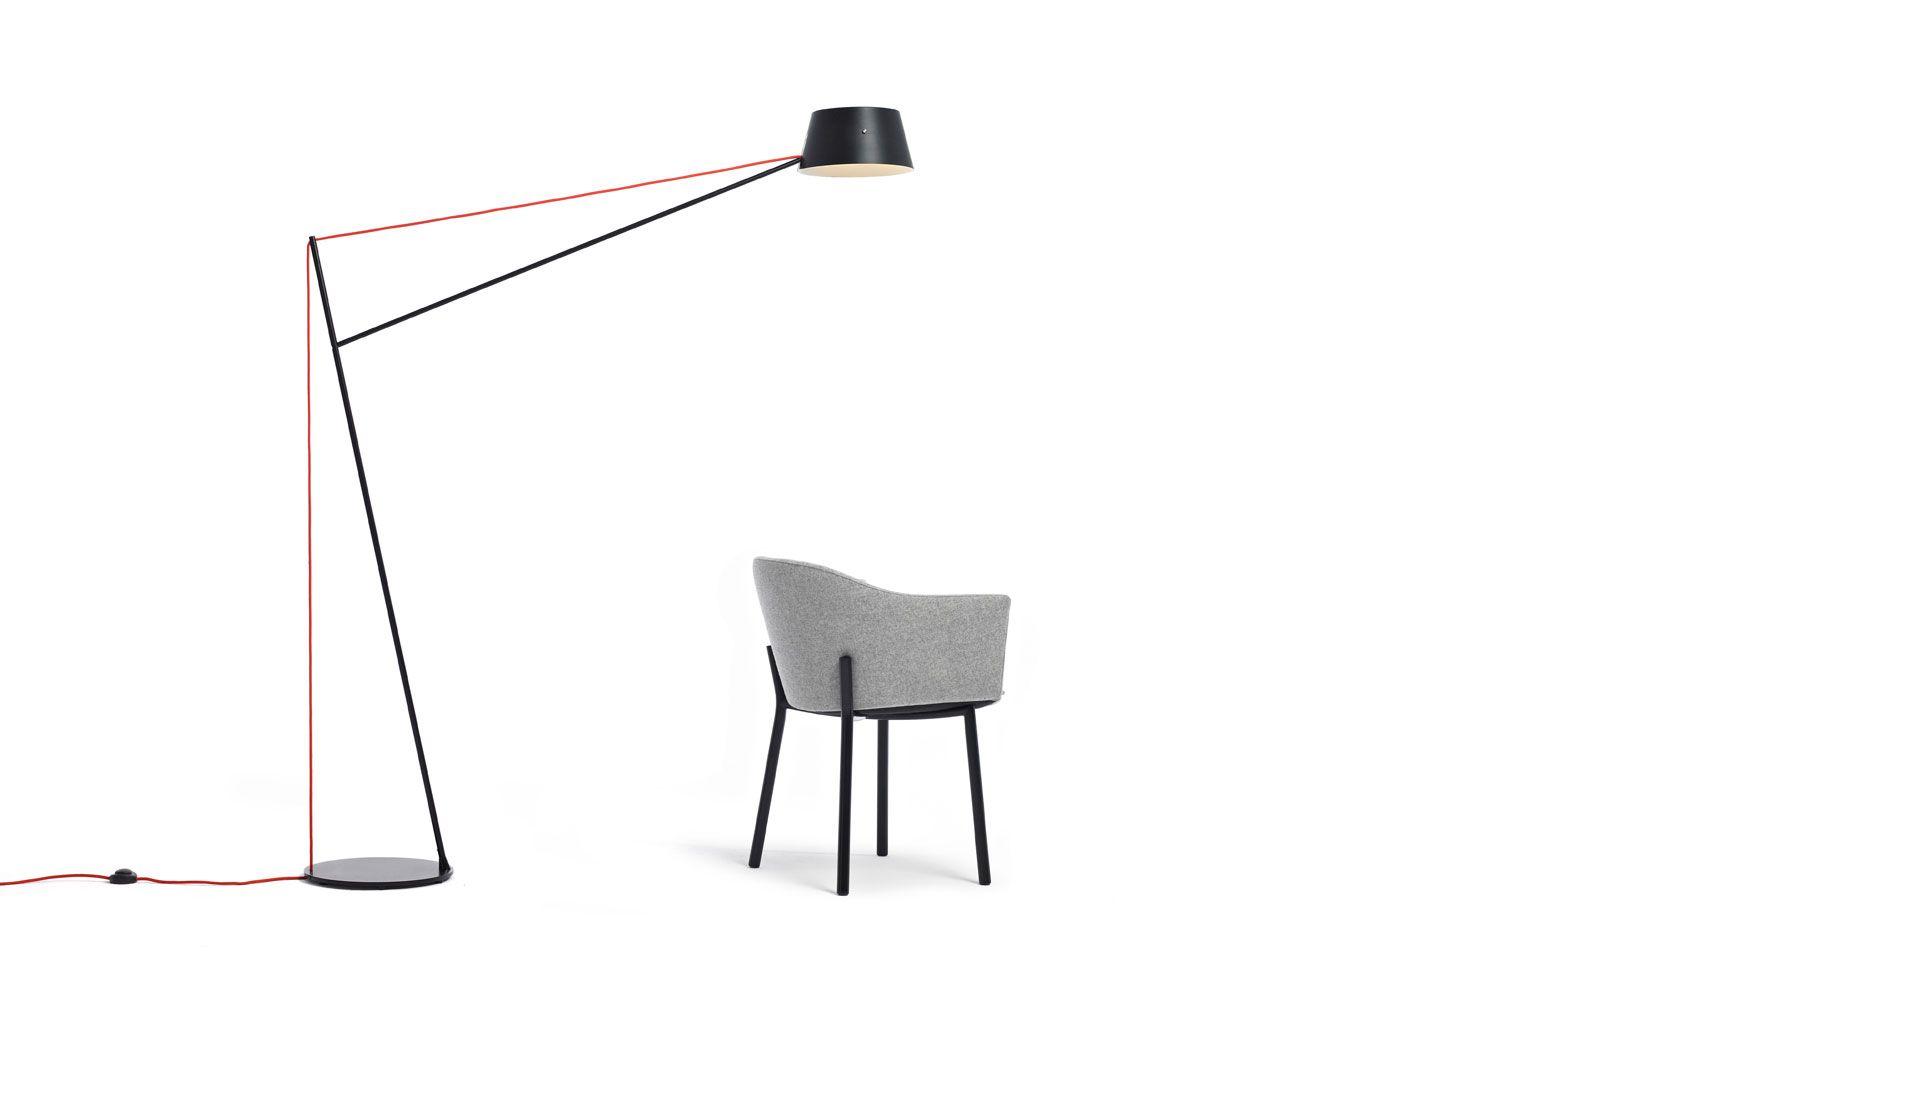 Spar Floor Light By Jamie Mclellan For Resident L Ighting I Black Floor Lamp Furniture